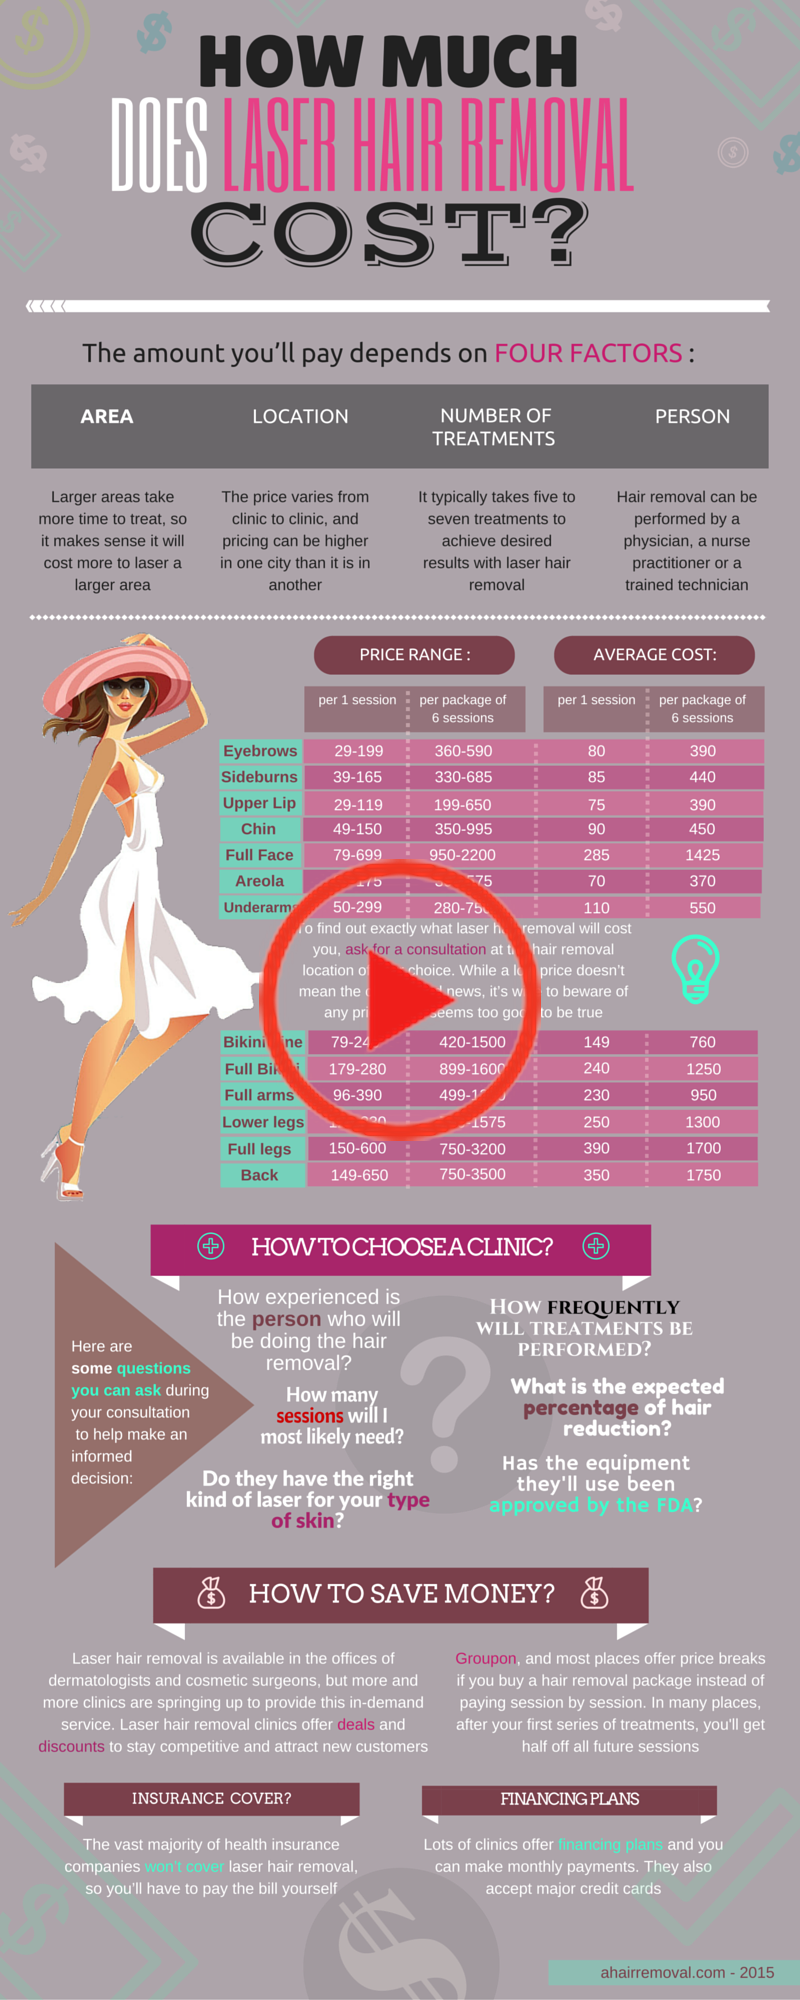 haarfarbentrends2020 in 2020 Laser hair removal cost